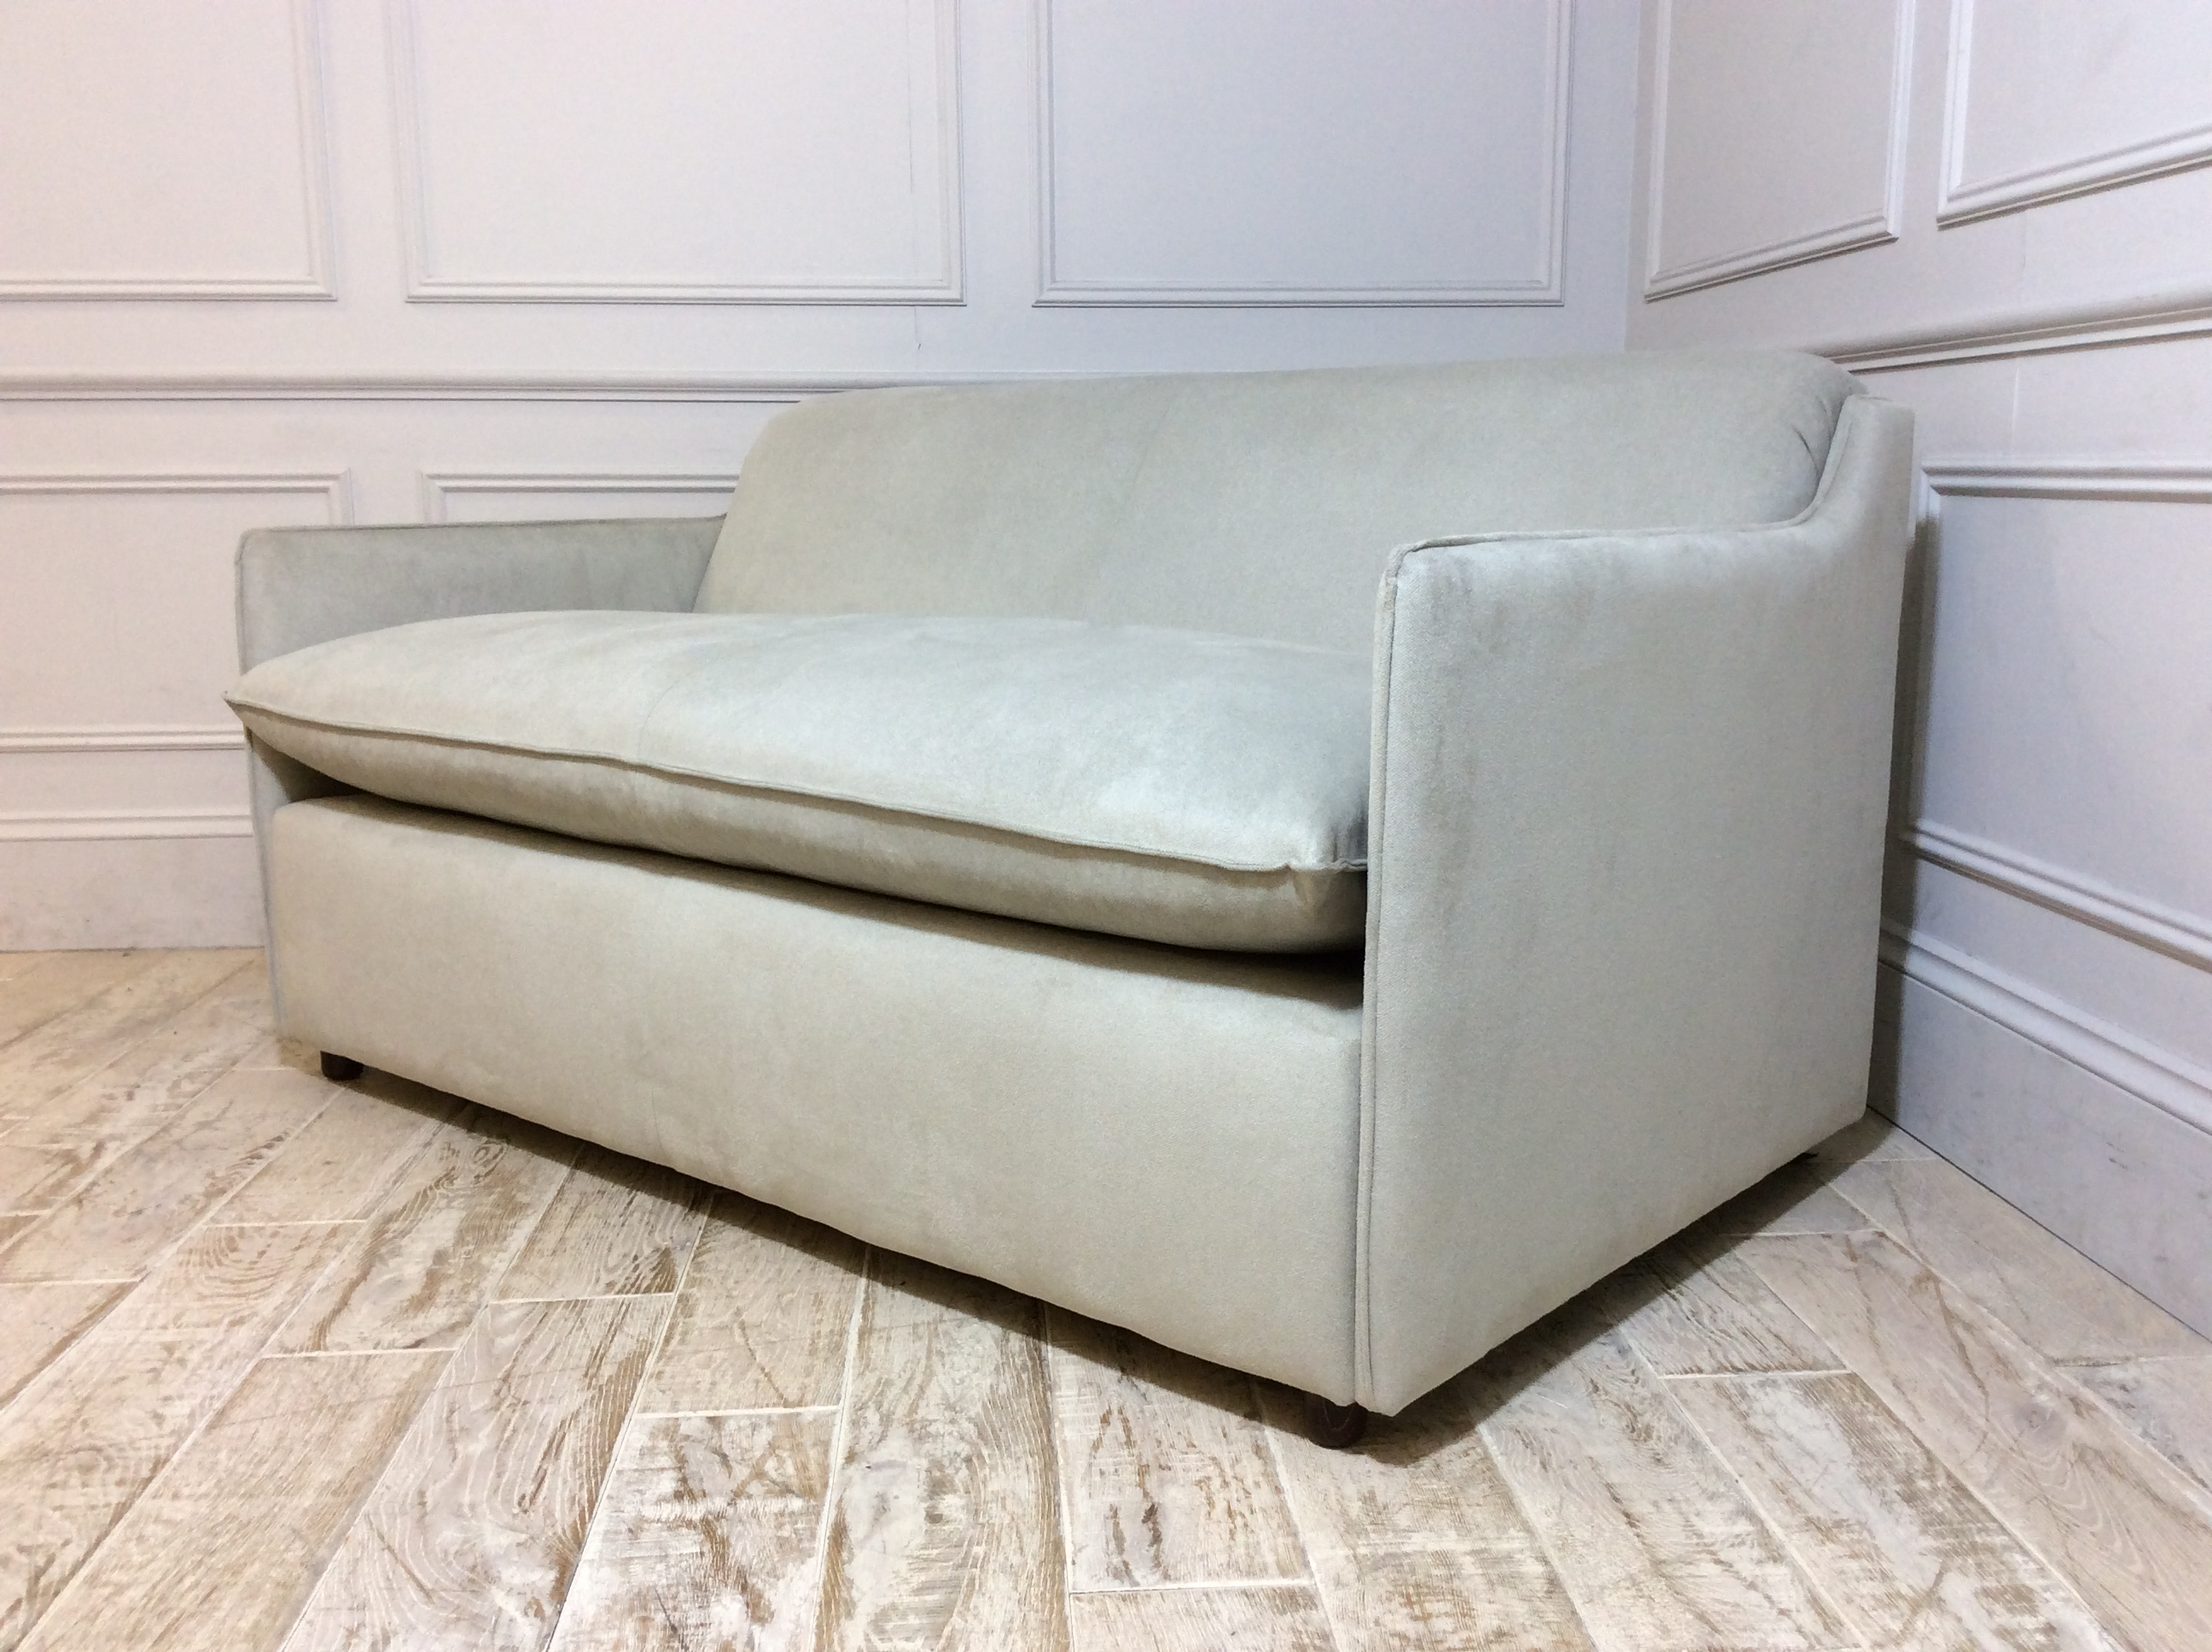 Norbury 3 Seater Sofa in Fleece